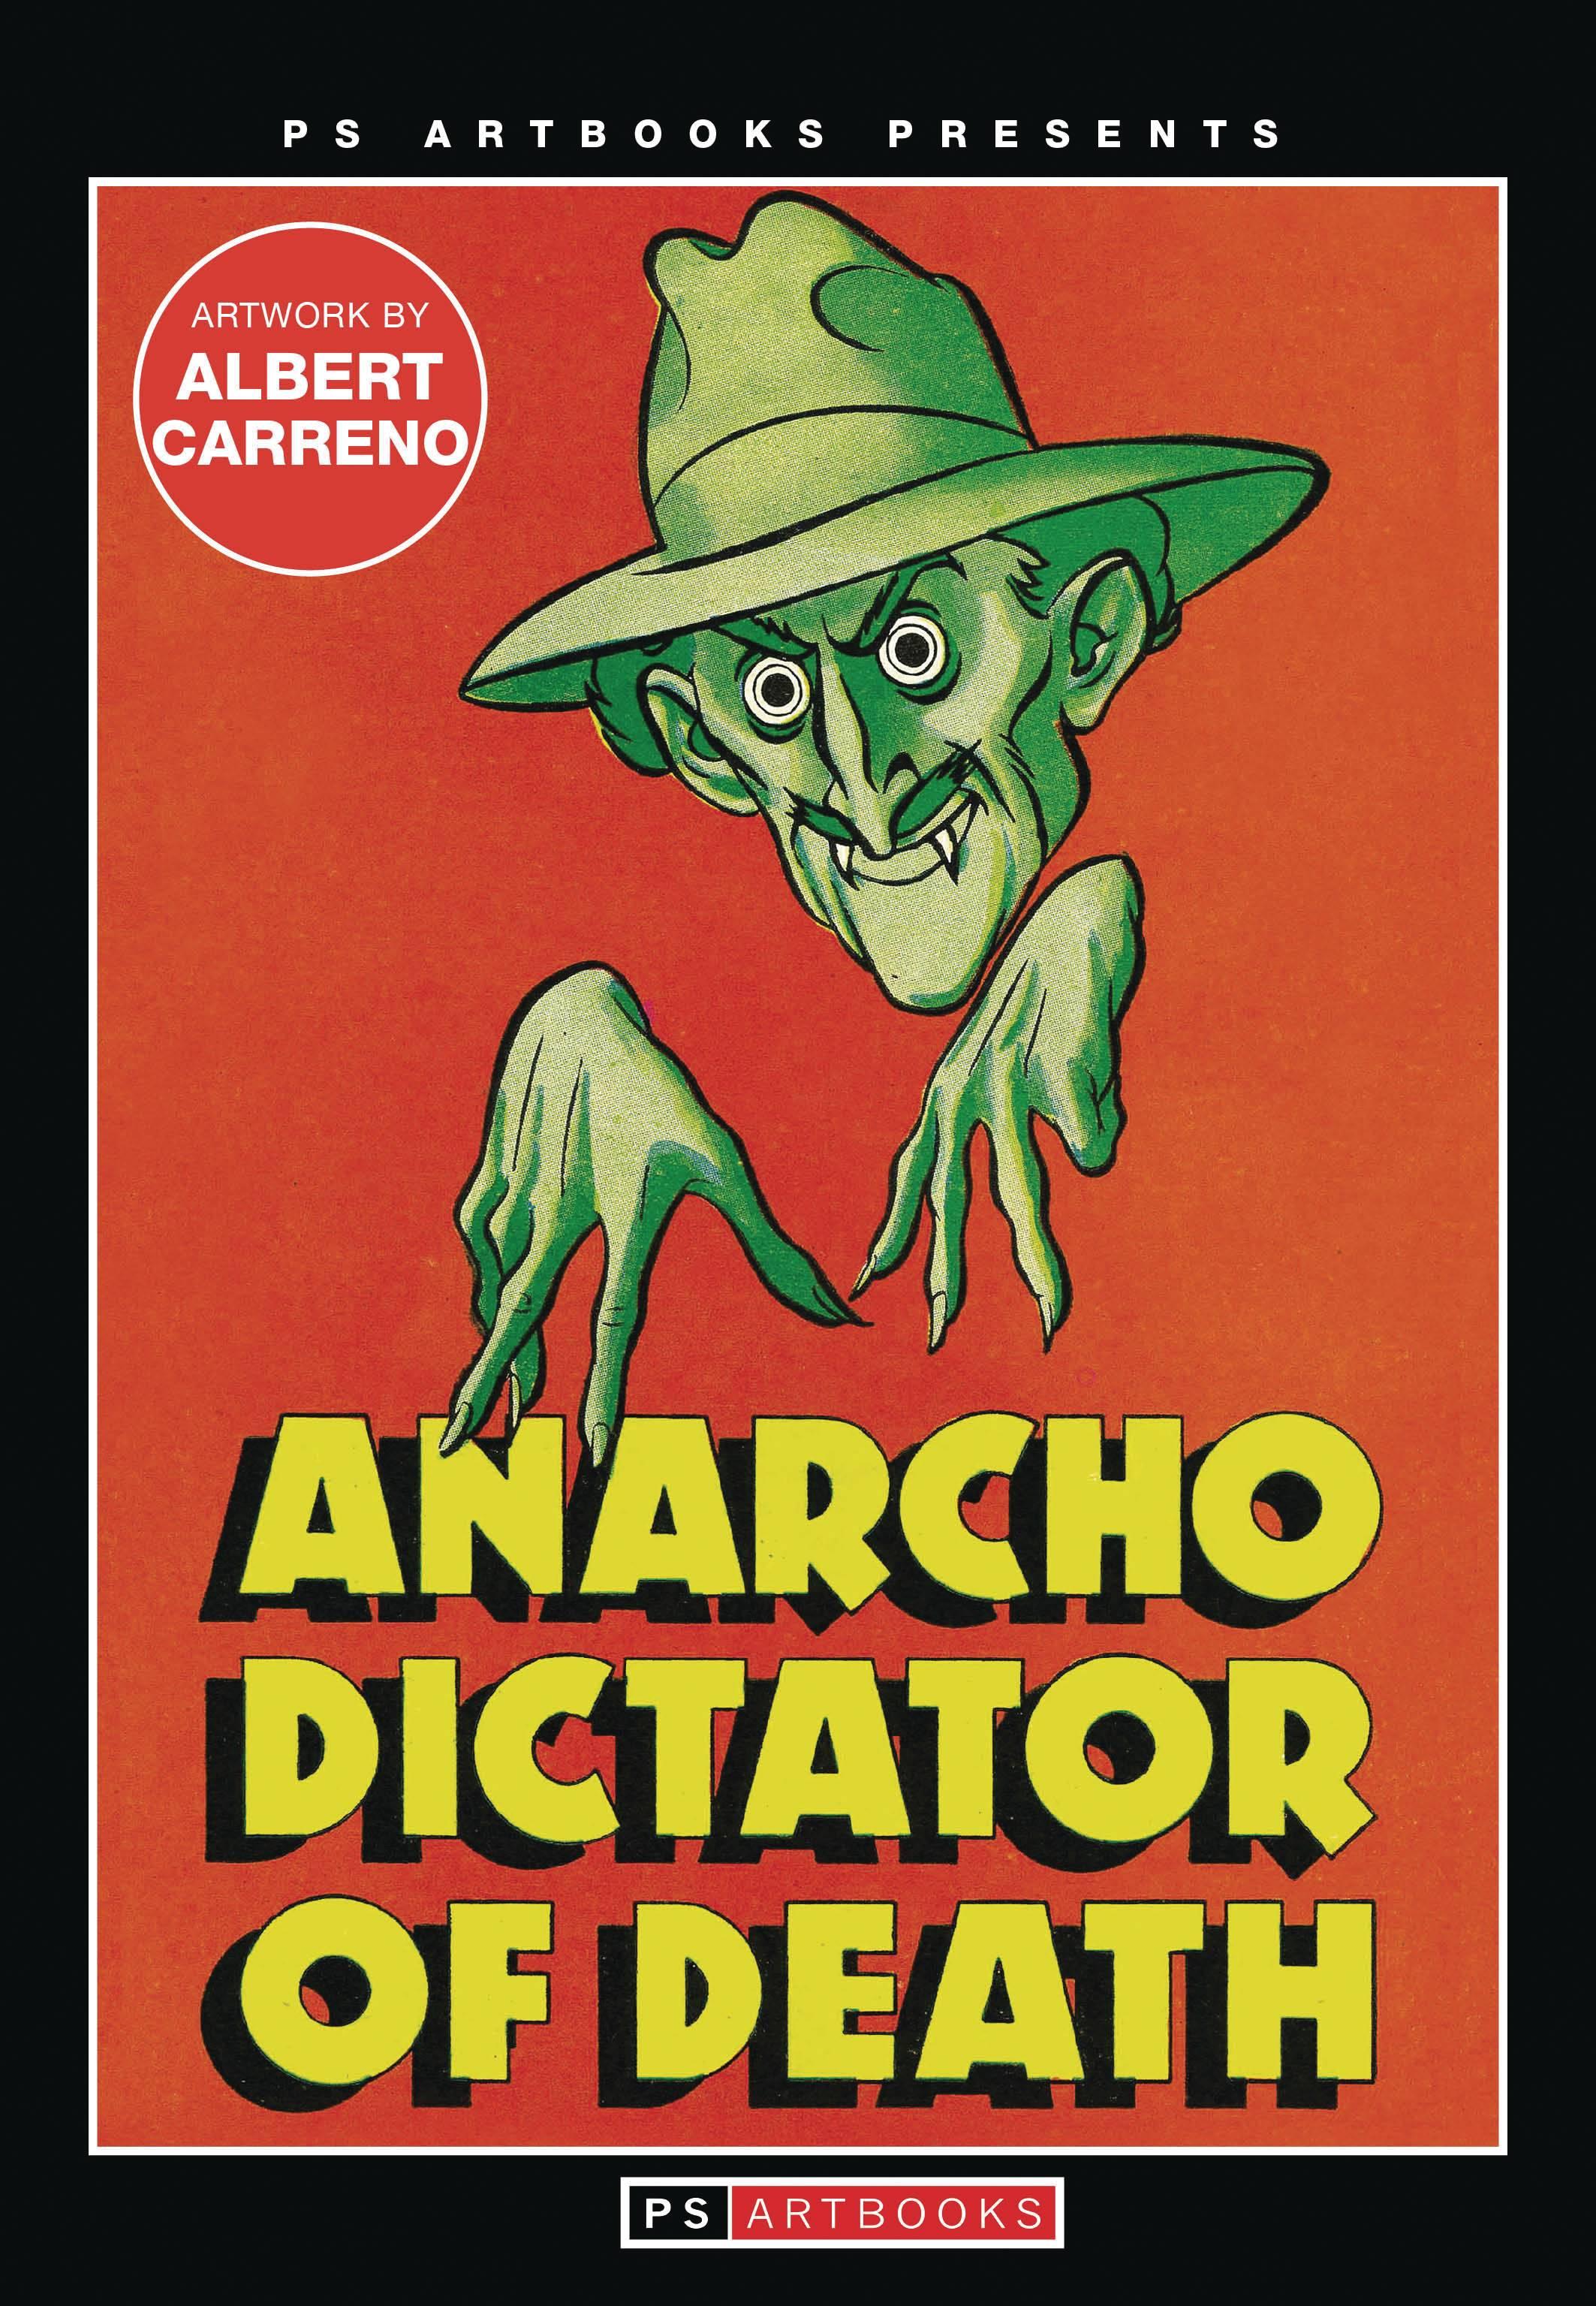 PS ARTBOOKS MAGAZINE ANARCHO DICTATOR OF DEATH